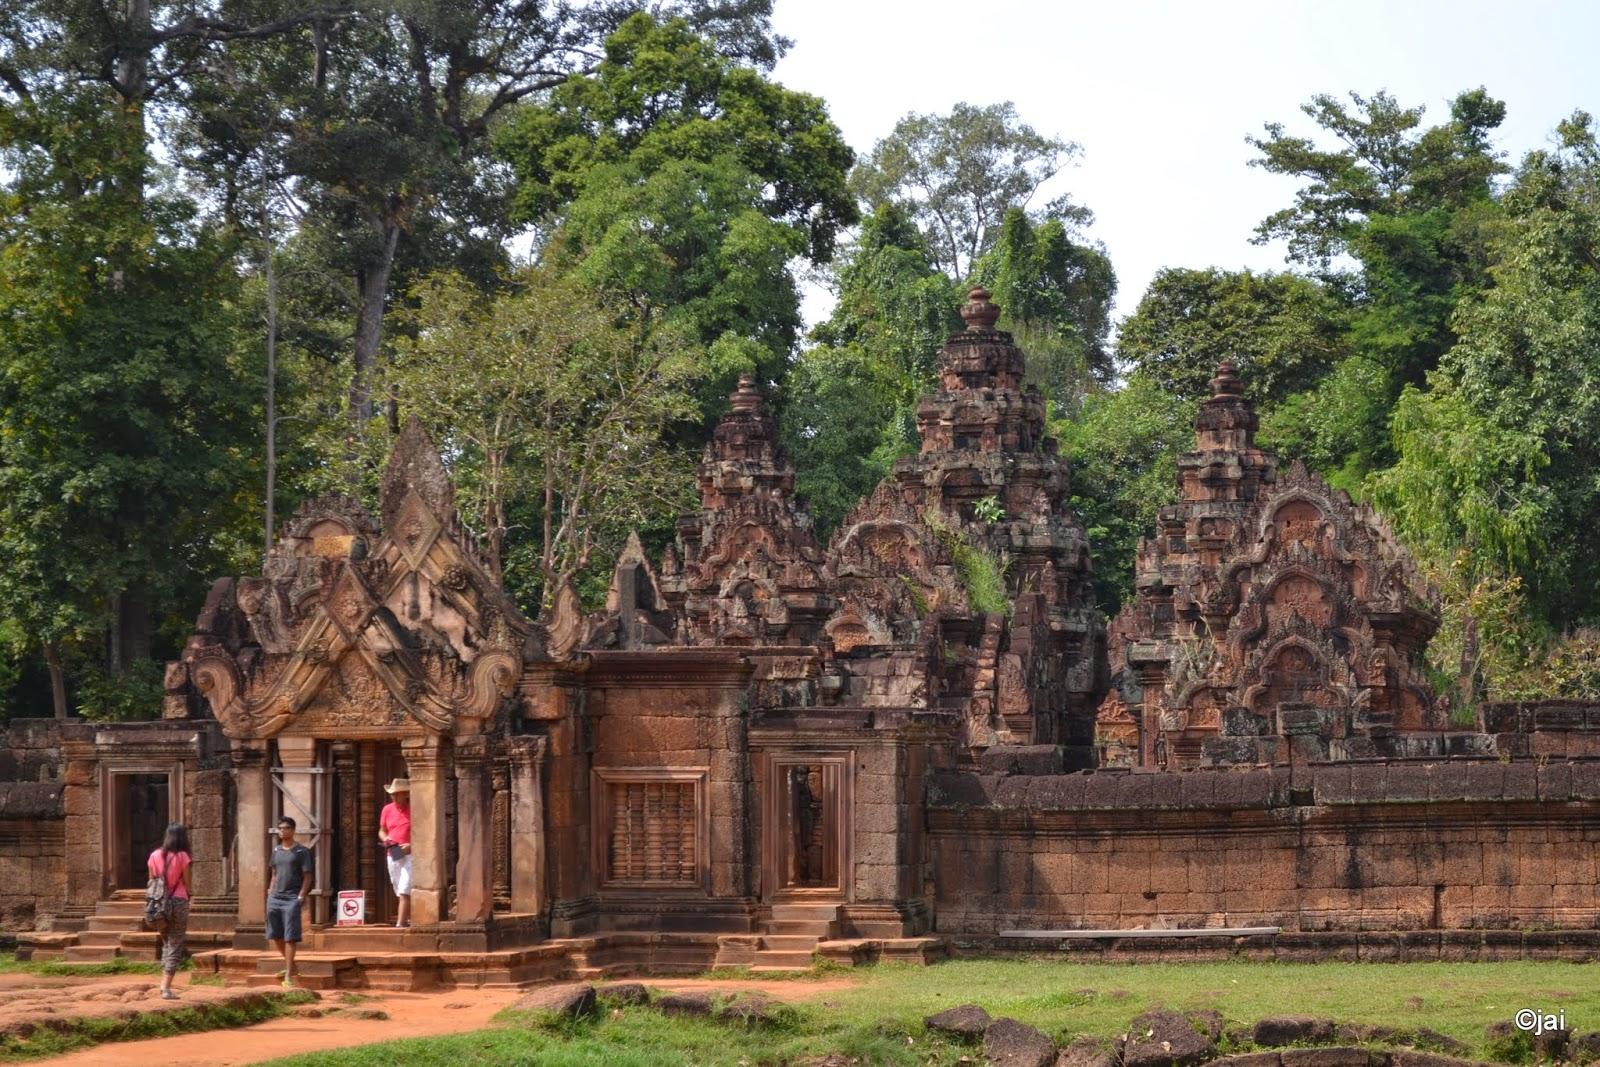 Banteay Srei or Banteay Srey at Angkor, Cambodi